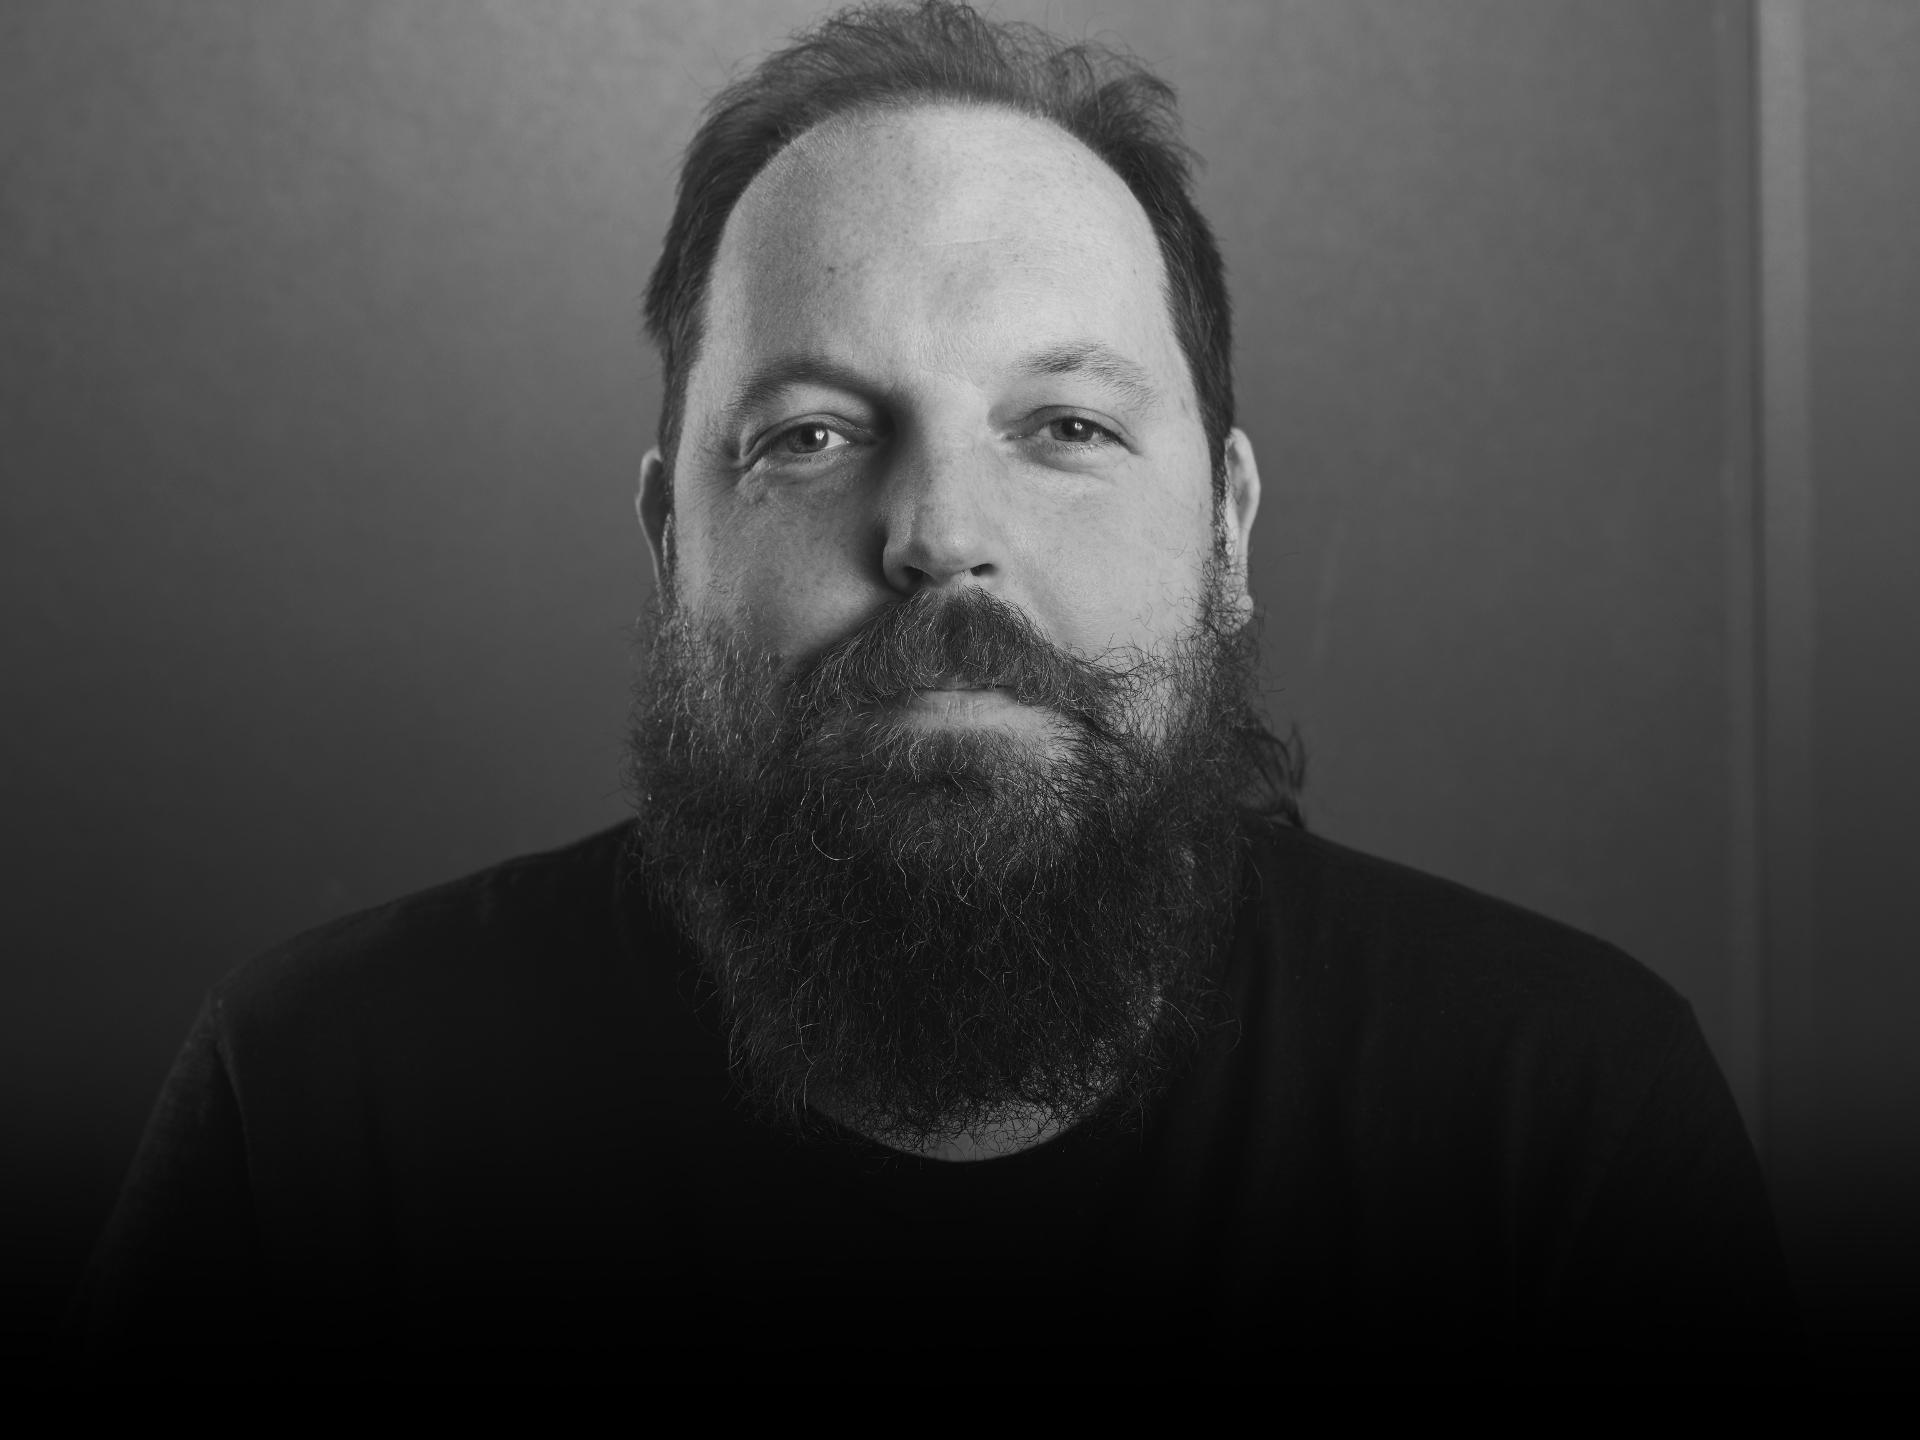 Image of Chad Hopenwasser